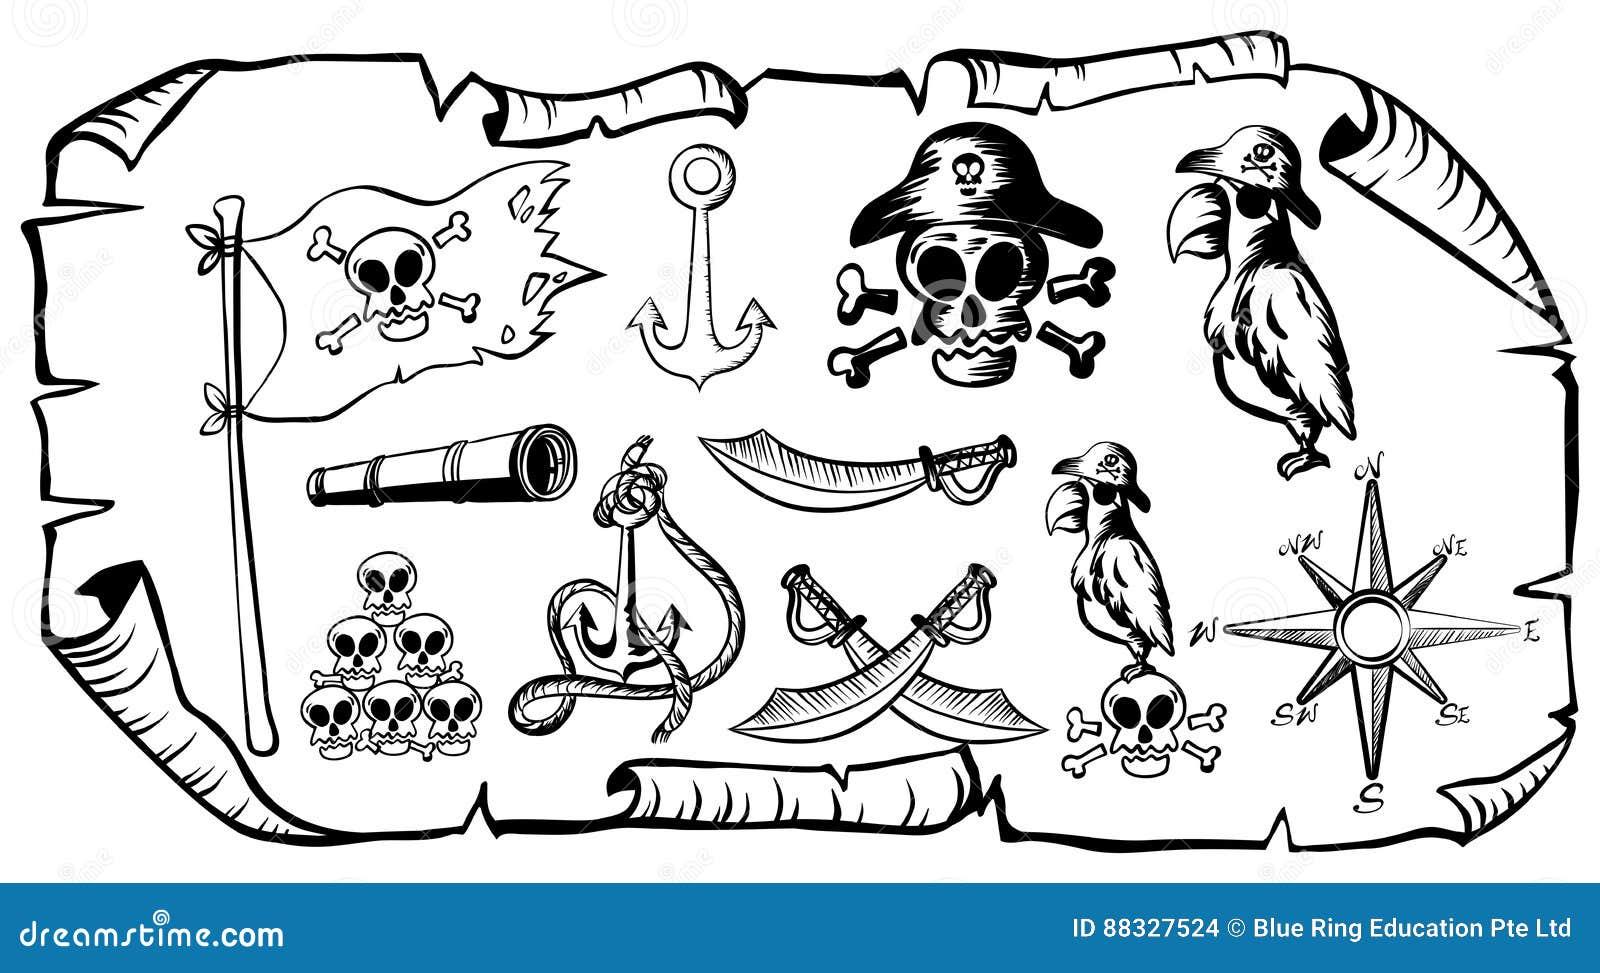 schatzkarte mit piratensymbolen vektor abbildung